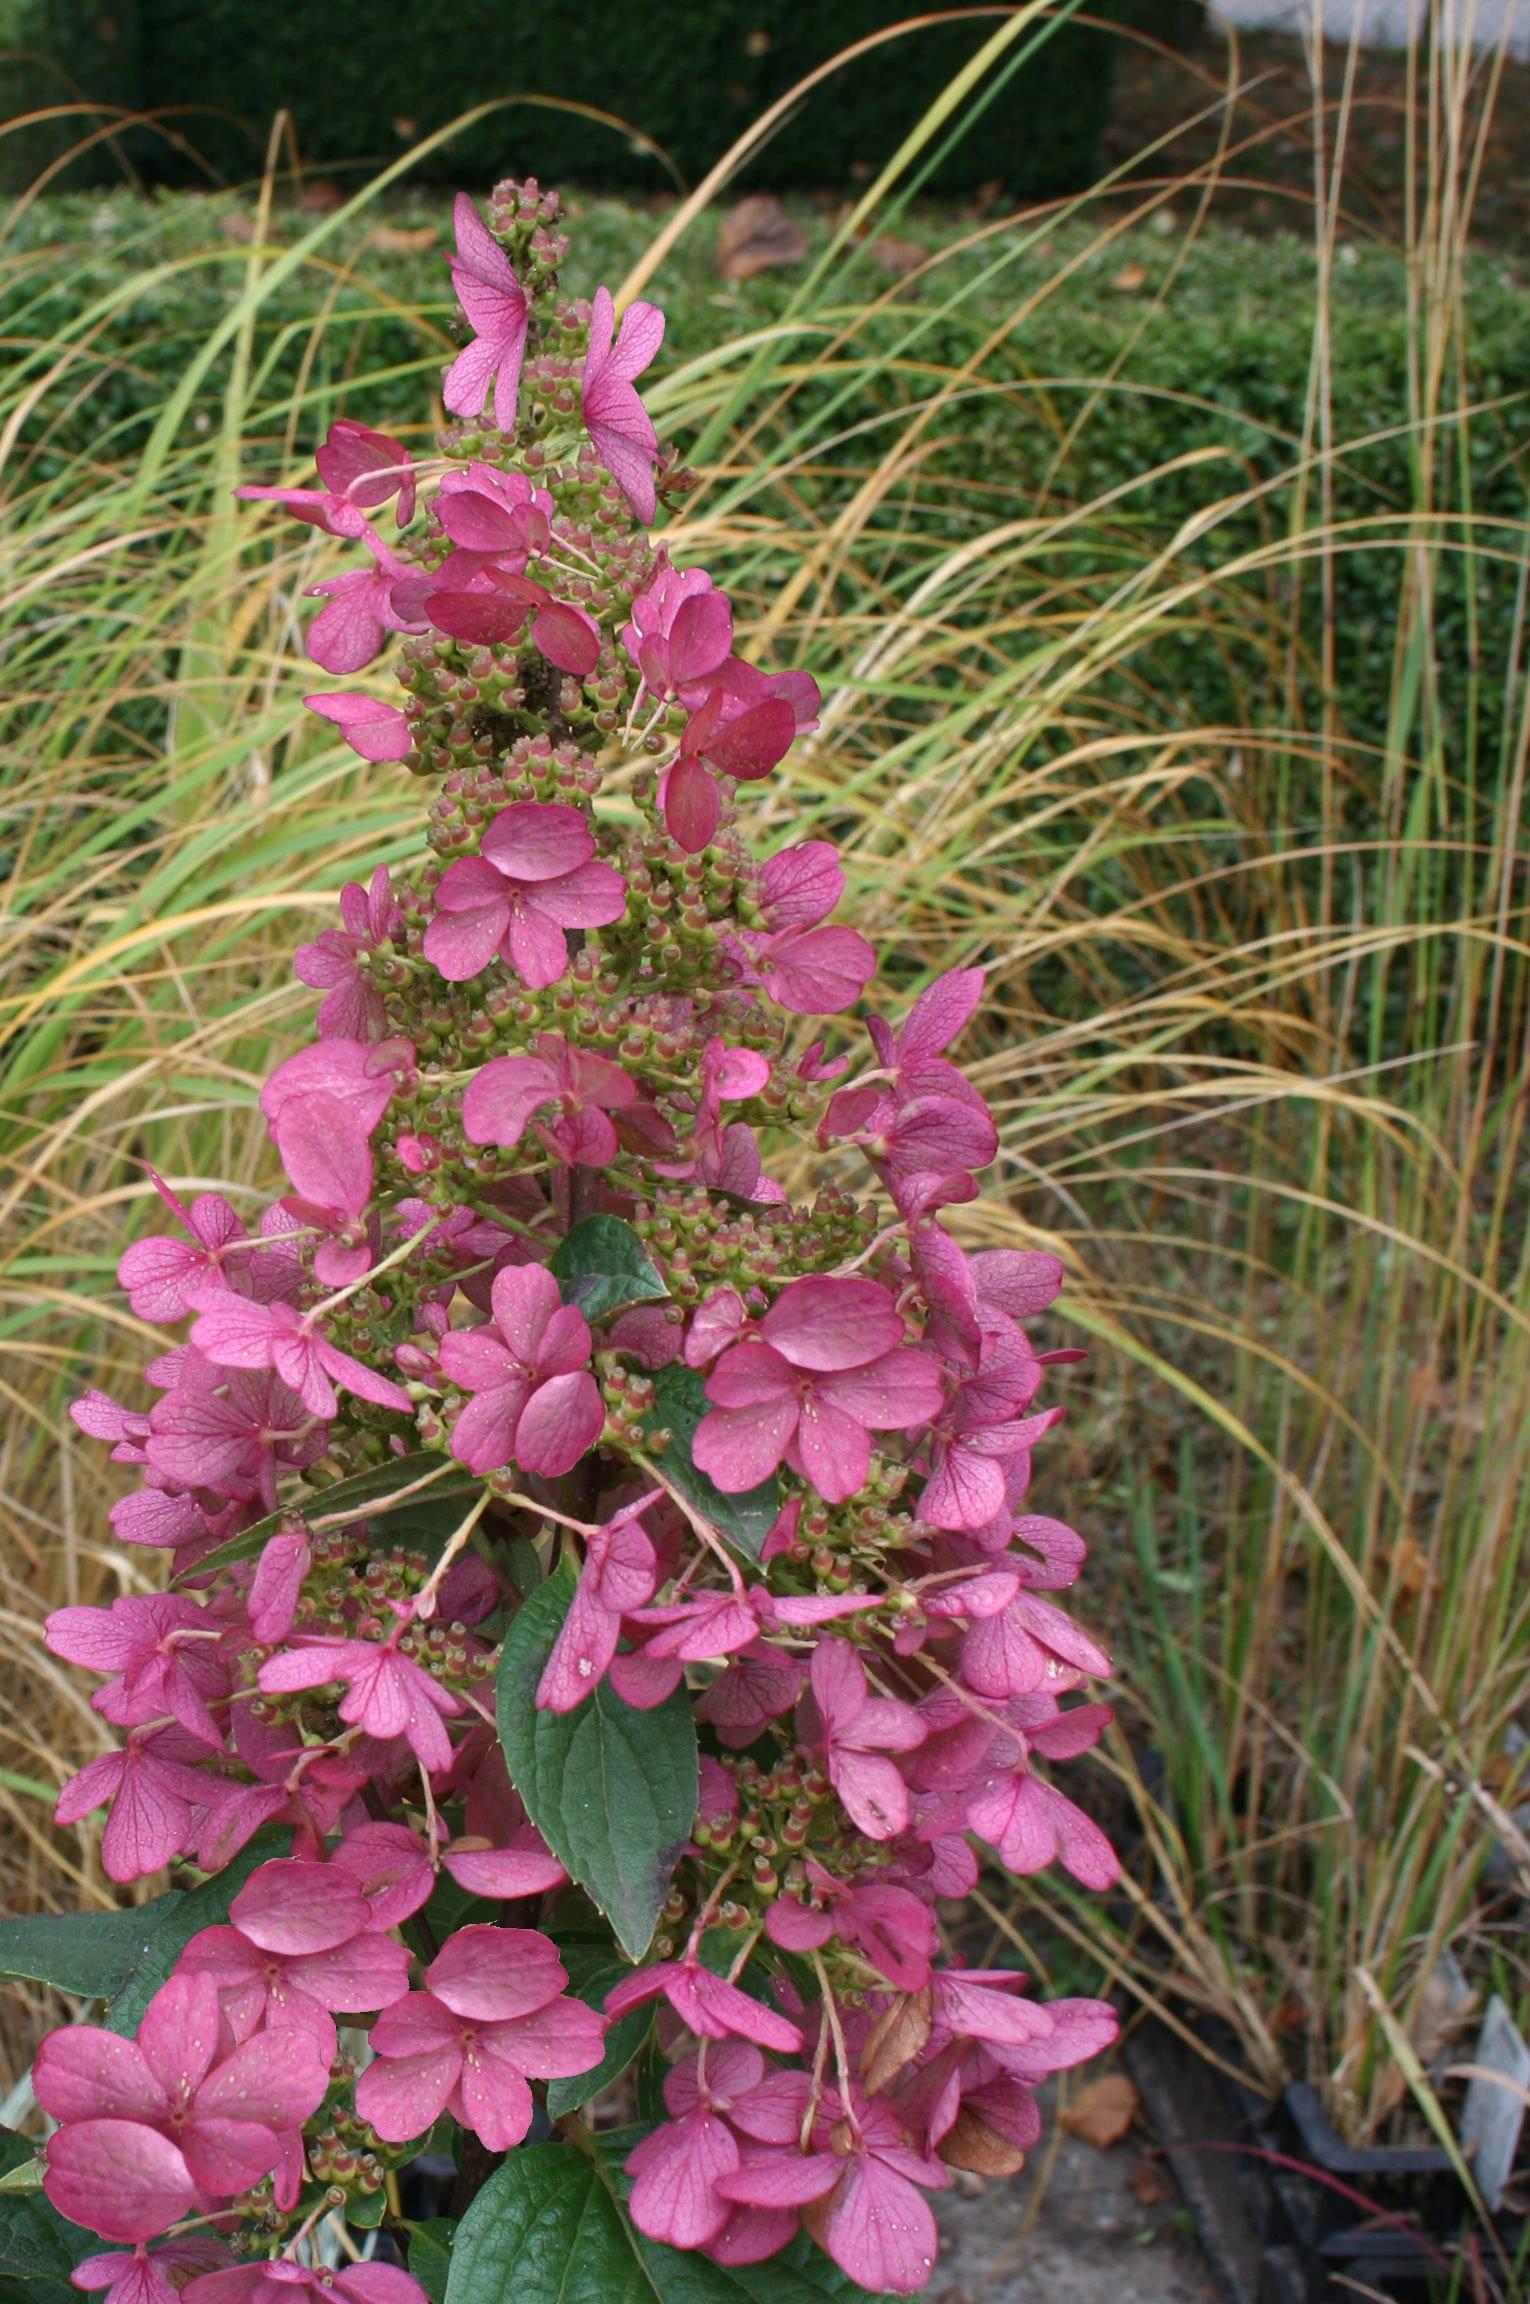 Hydrangea paniculata \'Candlelight\' | Jos Kolster - Boomkwekerij